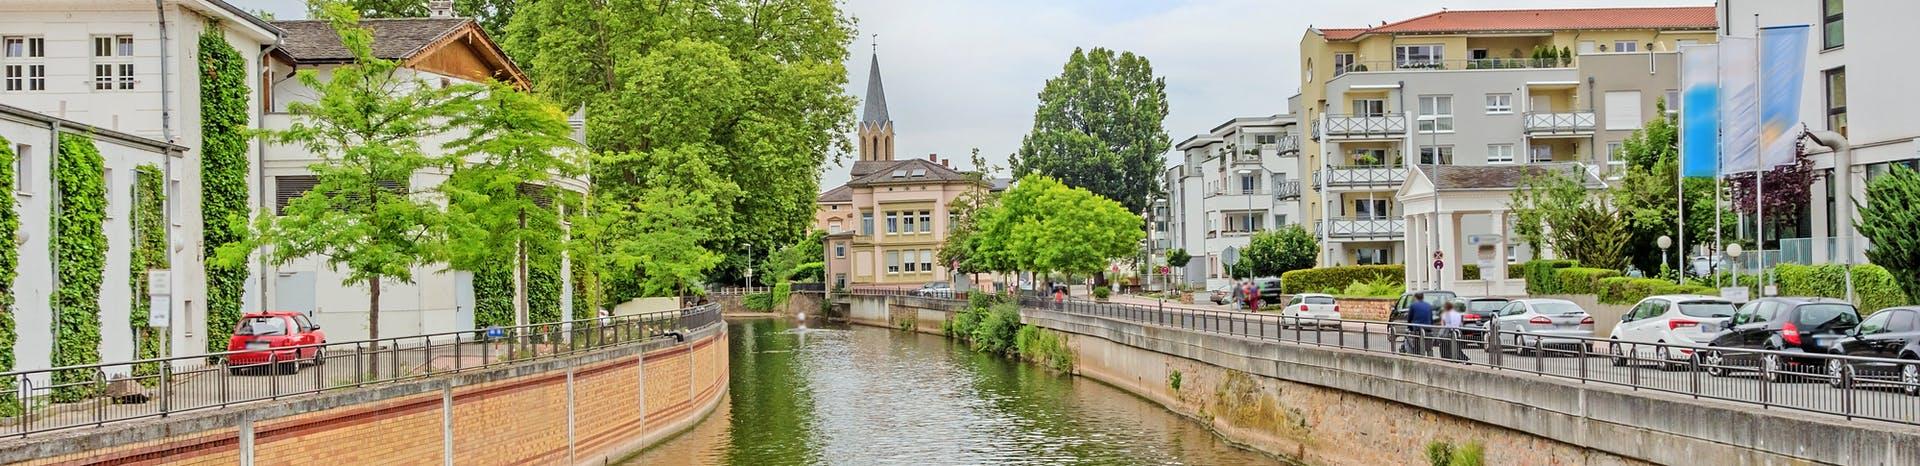 Picture of Bad Kreuznach